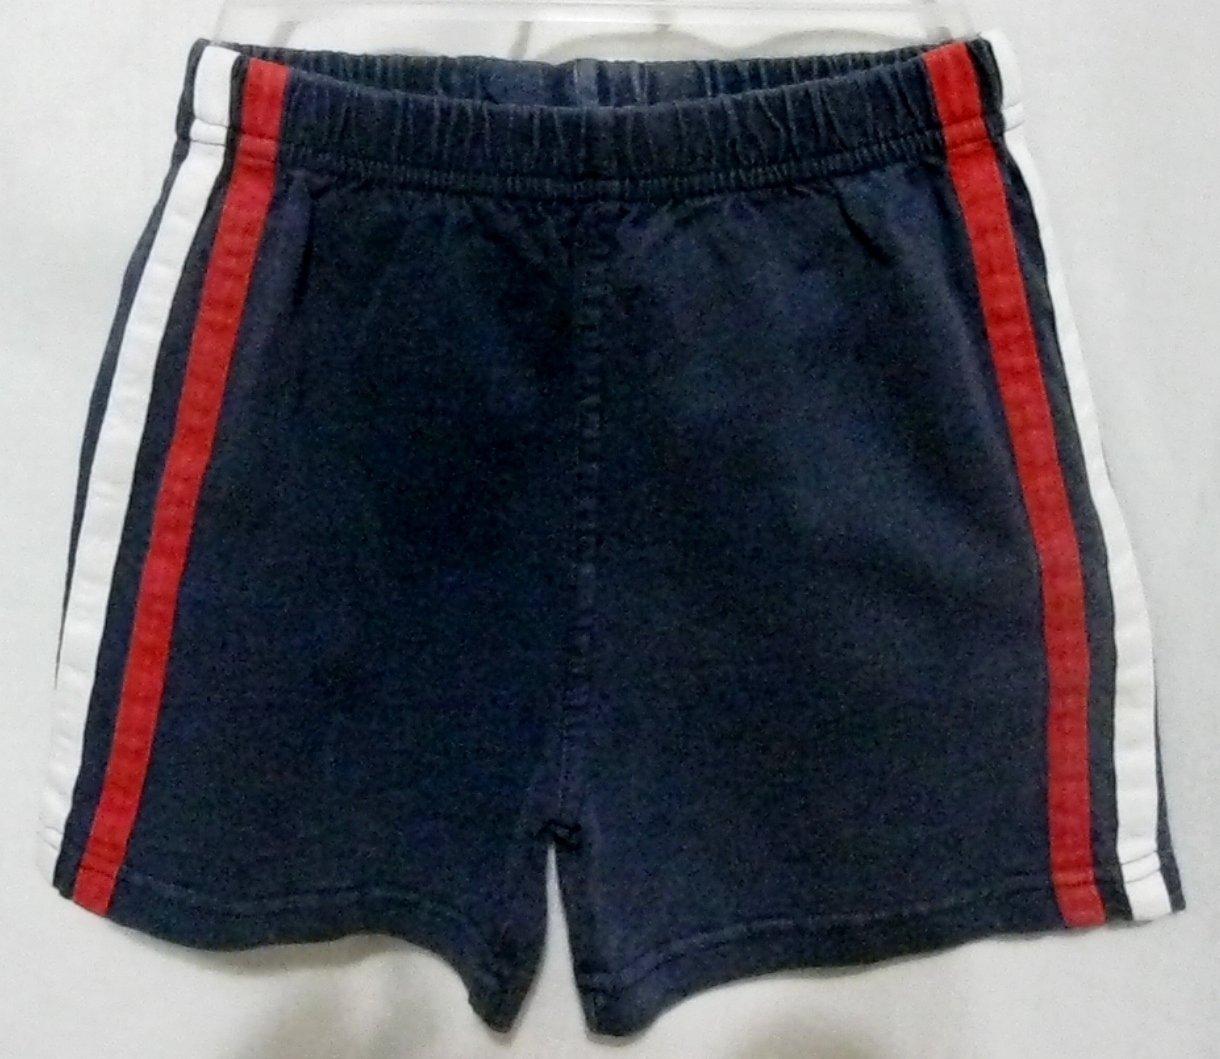 Boy's Spiderman-2 Shorts - Size 3T